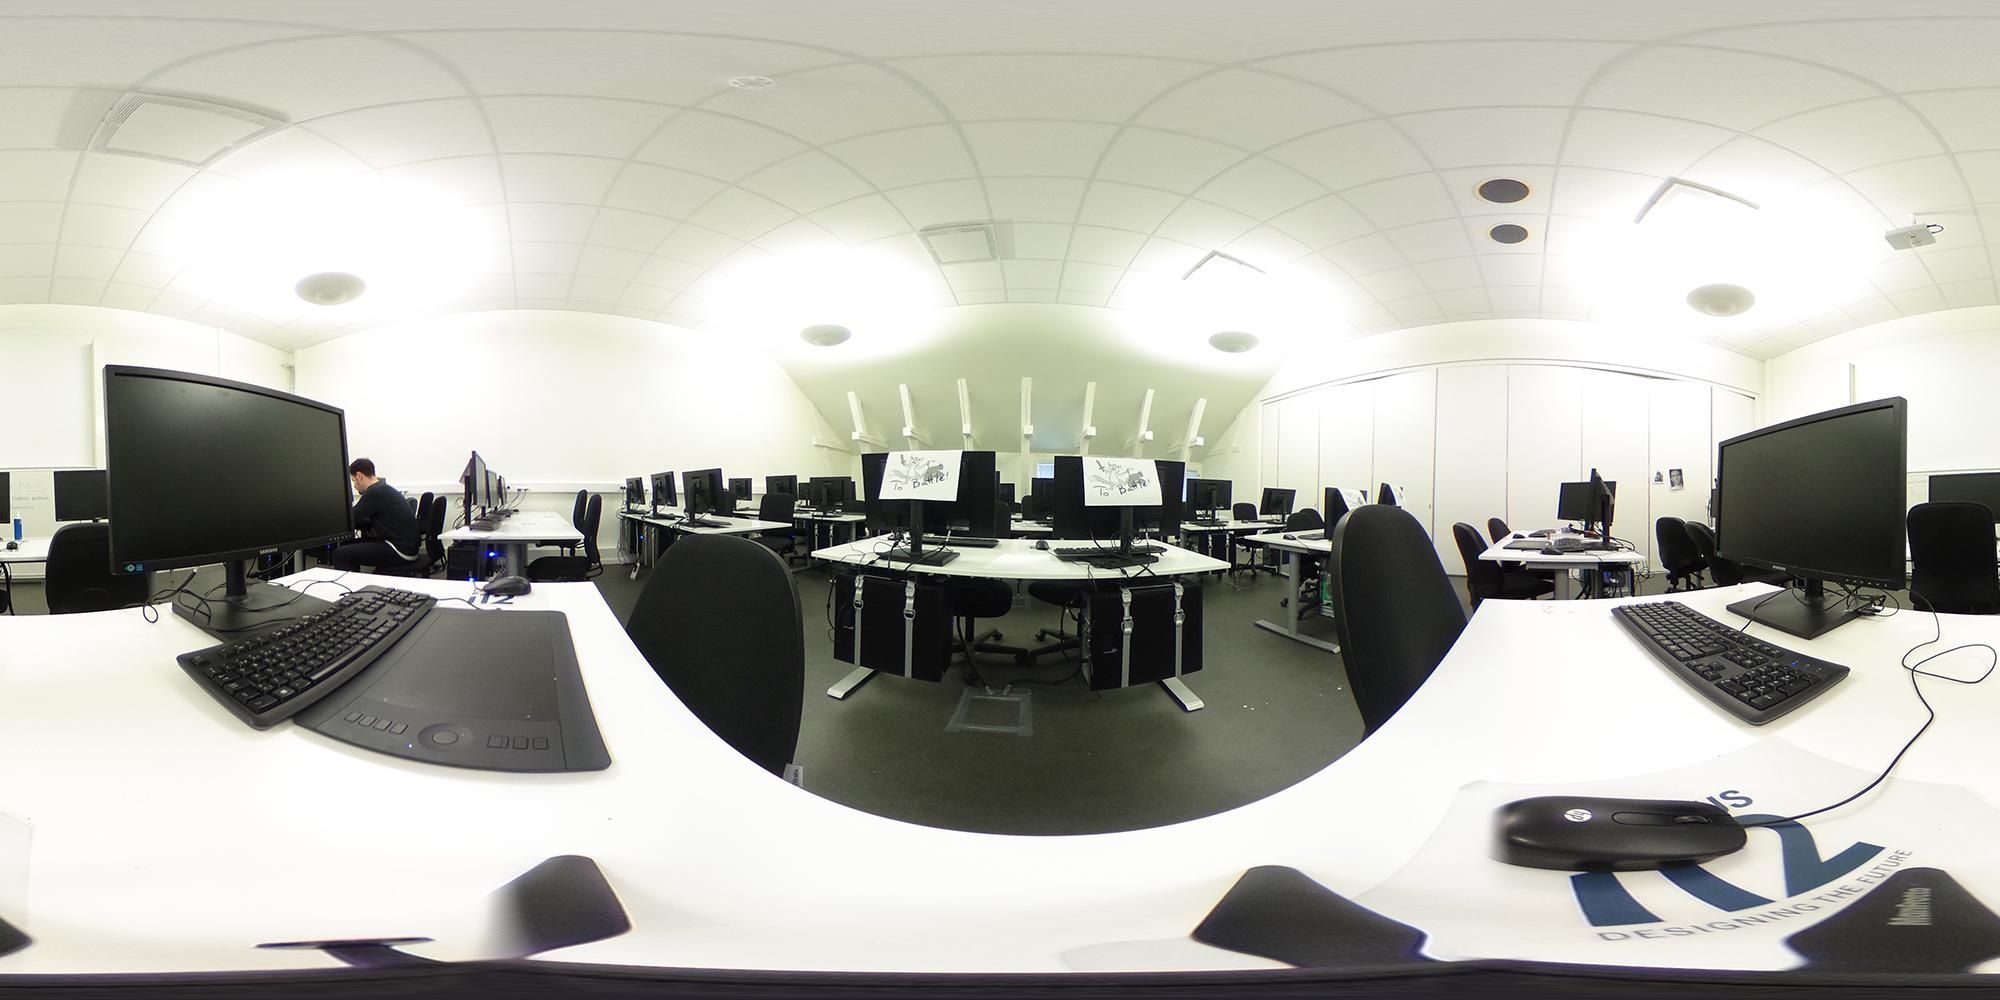 campus i12 class.